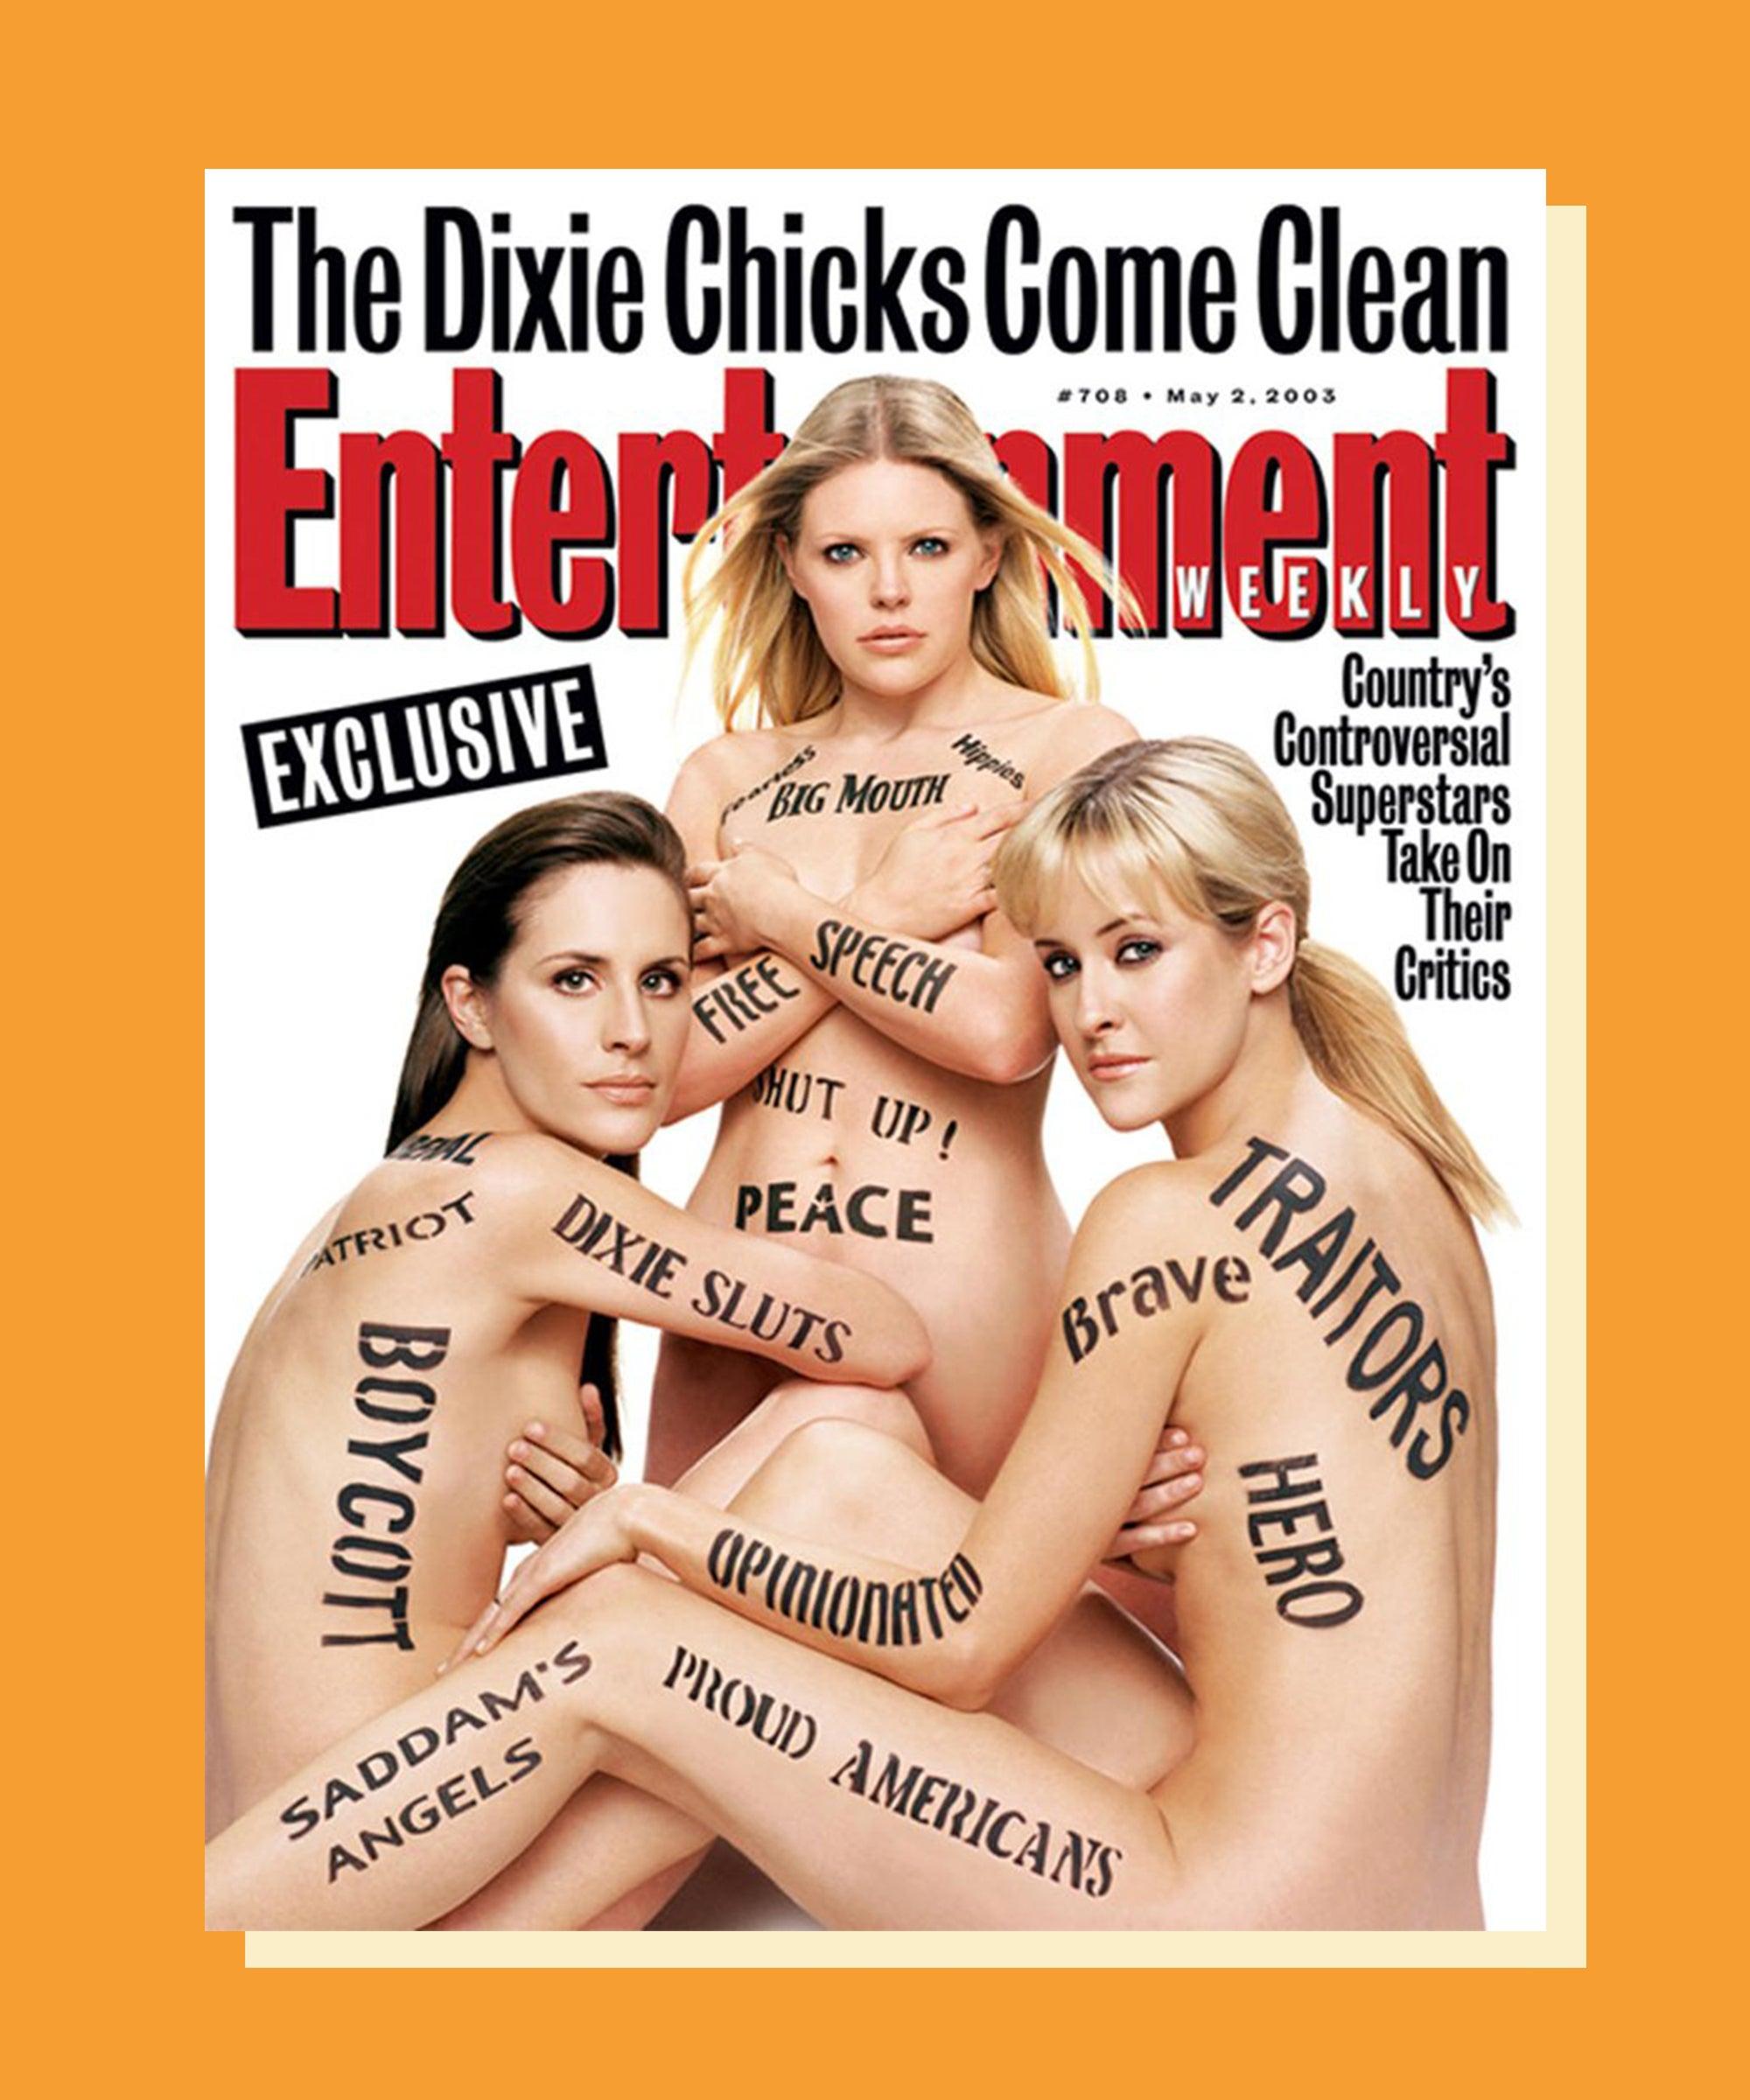 Dixie Chicks controversy